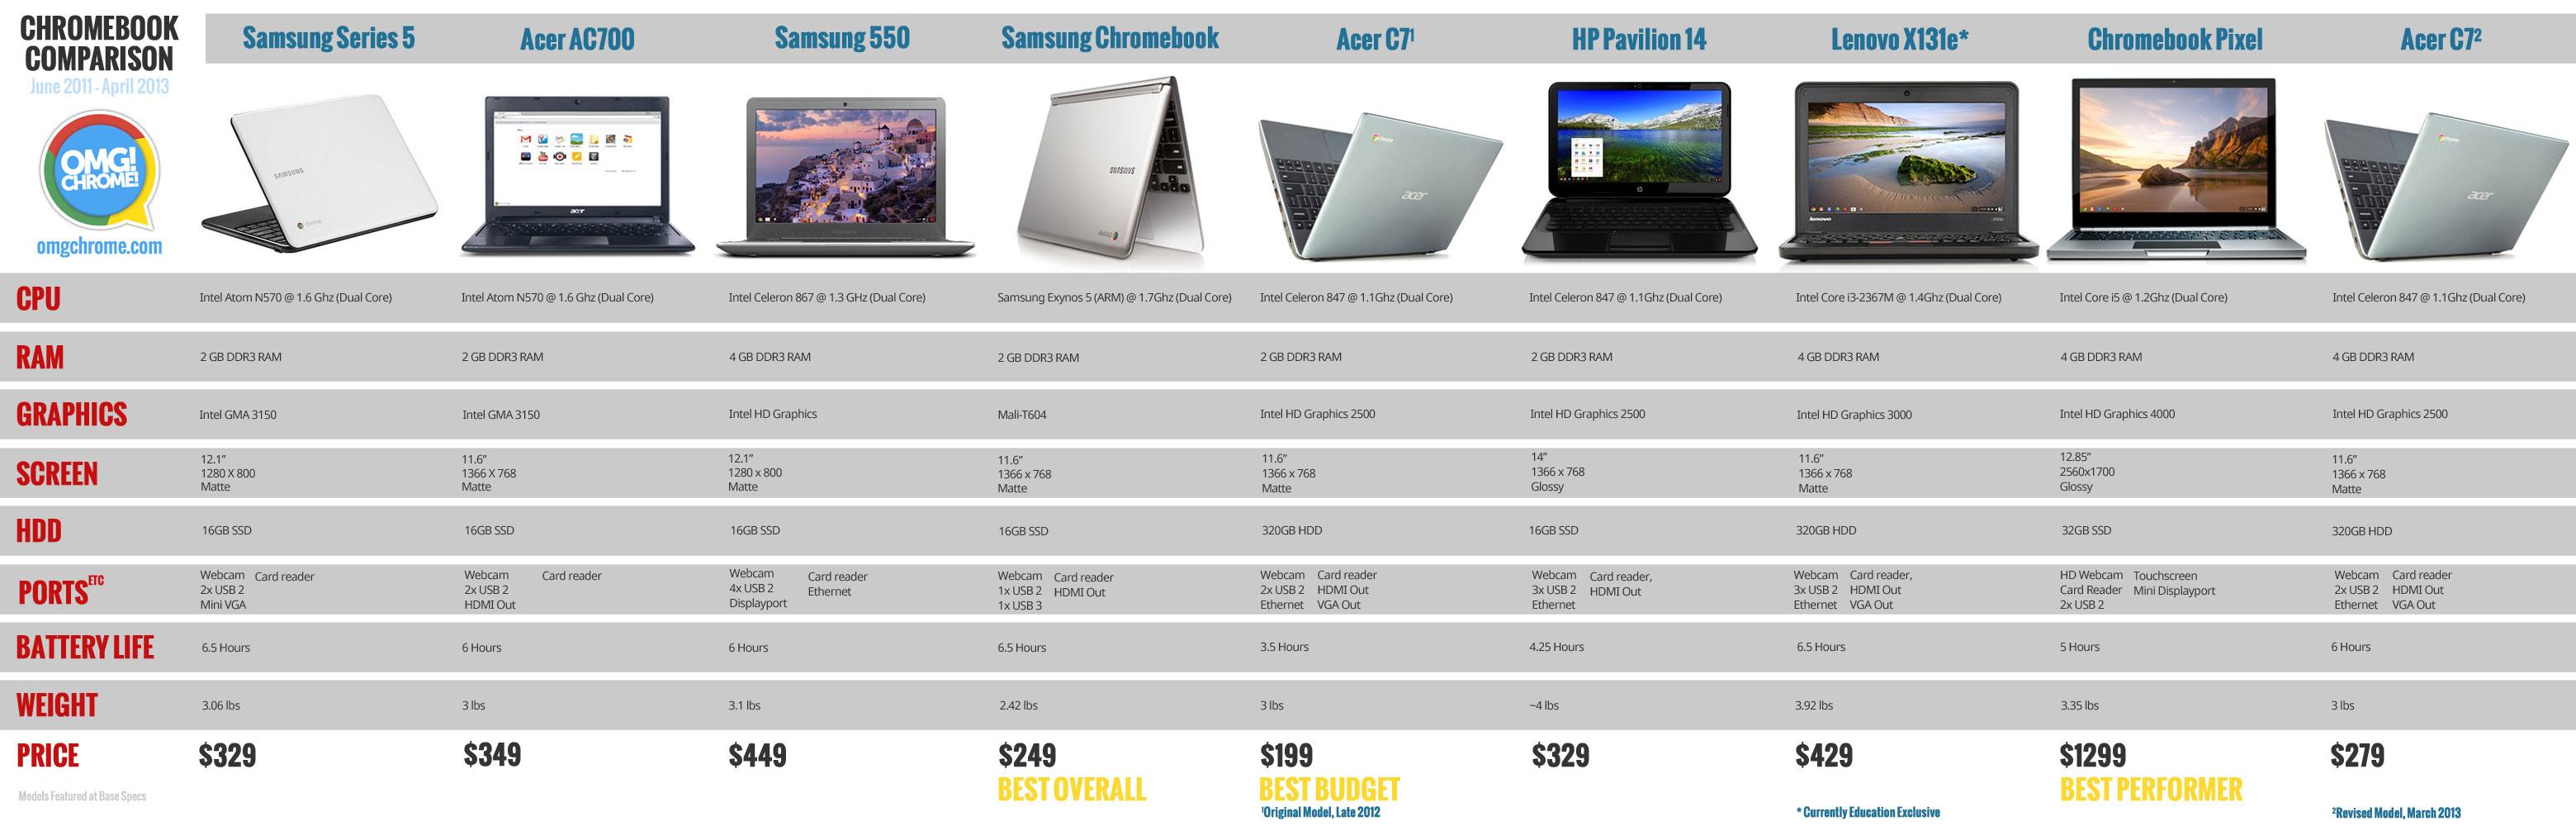 chromebook comparison chart: Which chromebook do you own reader poll omg chrome